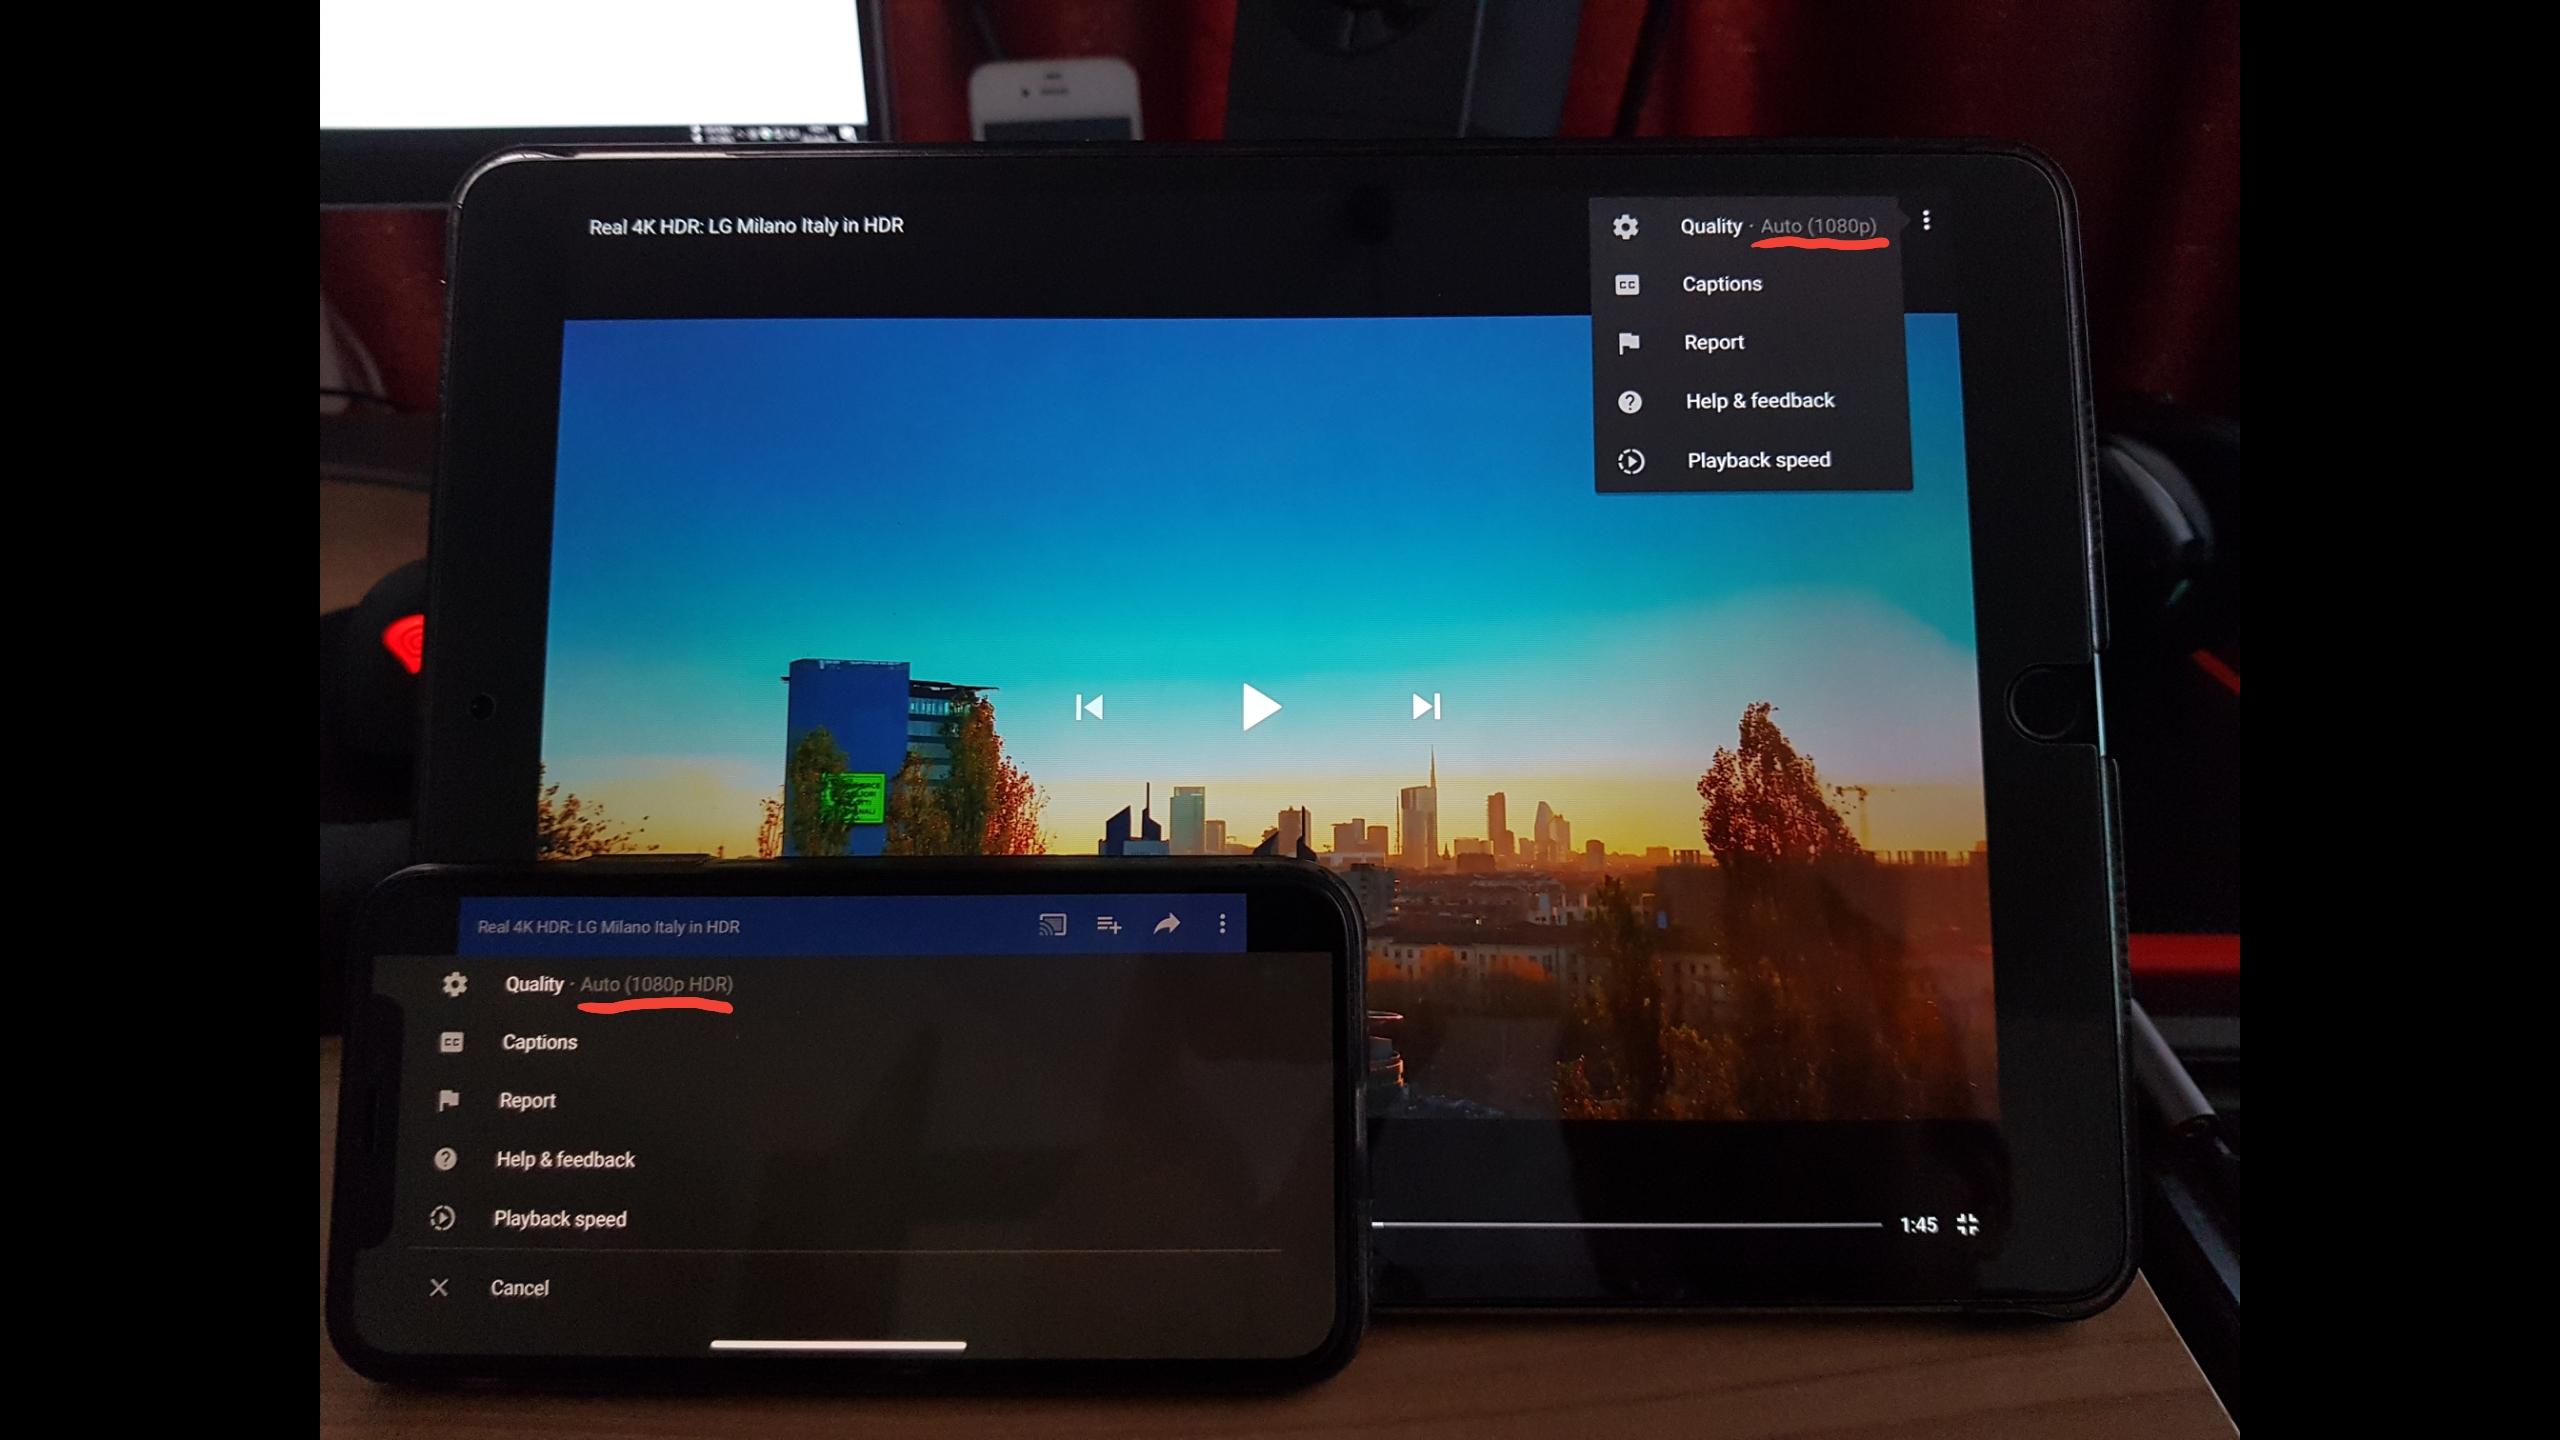 iPad Pro - iPad Pro 10 5 YouTube HDR! | MacRumors Forums